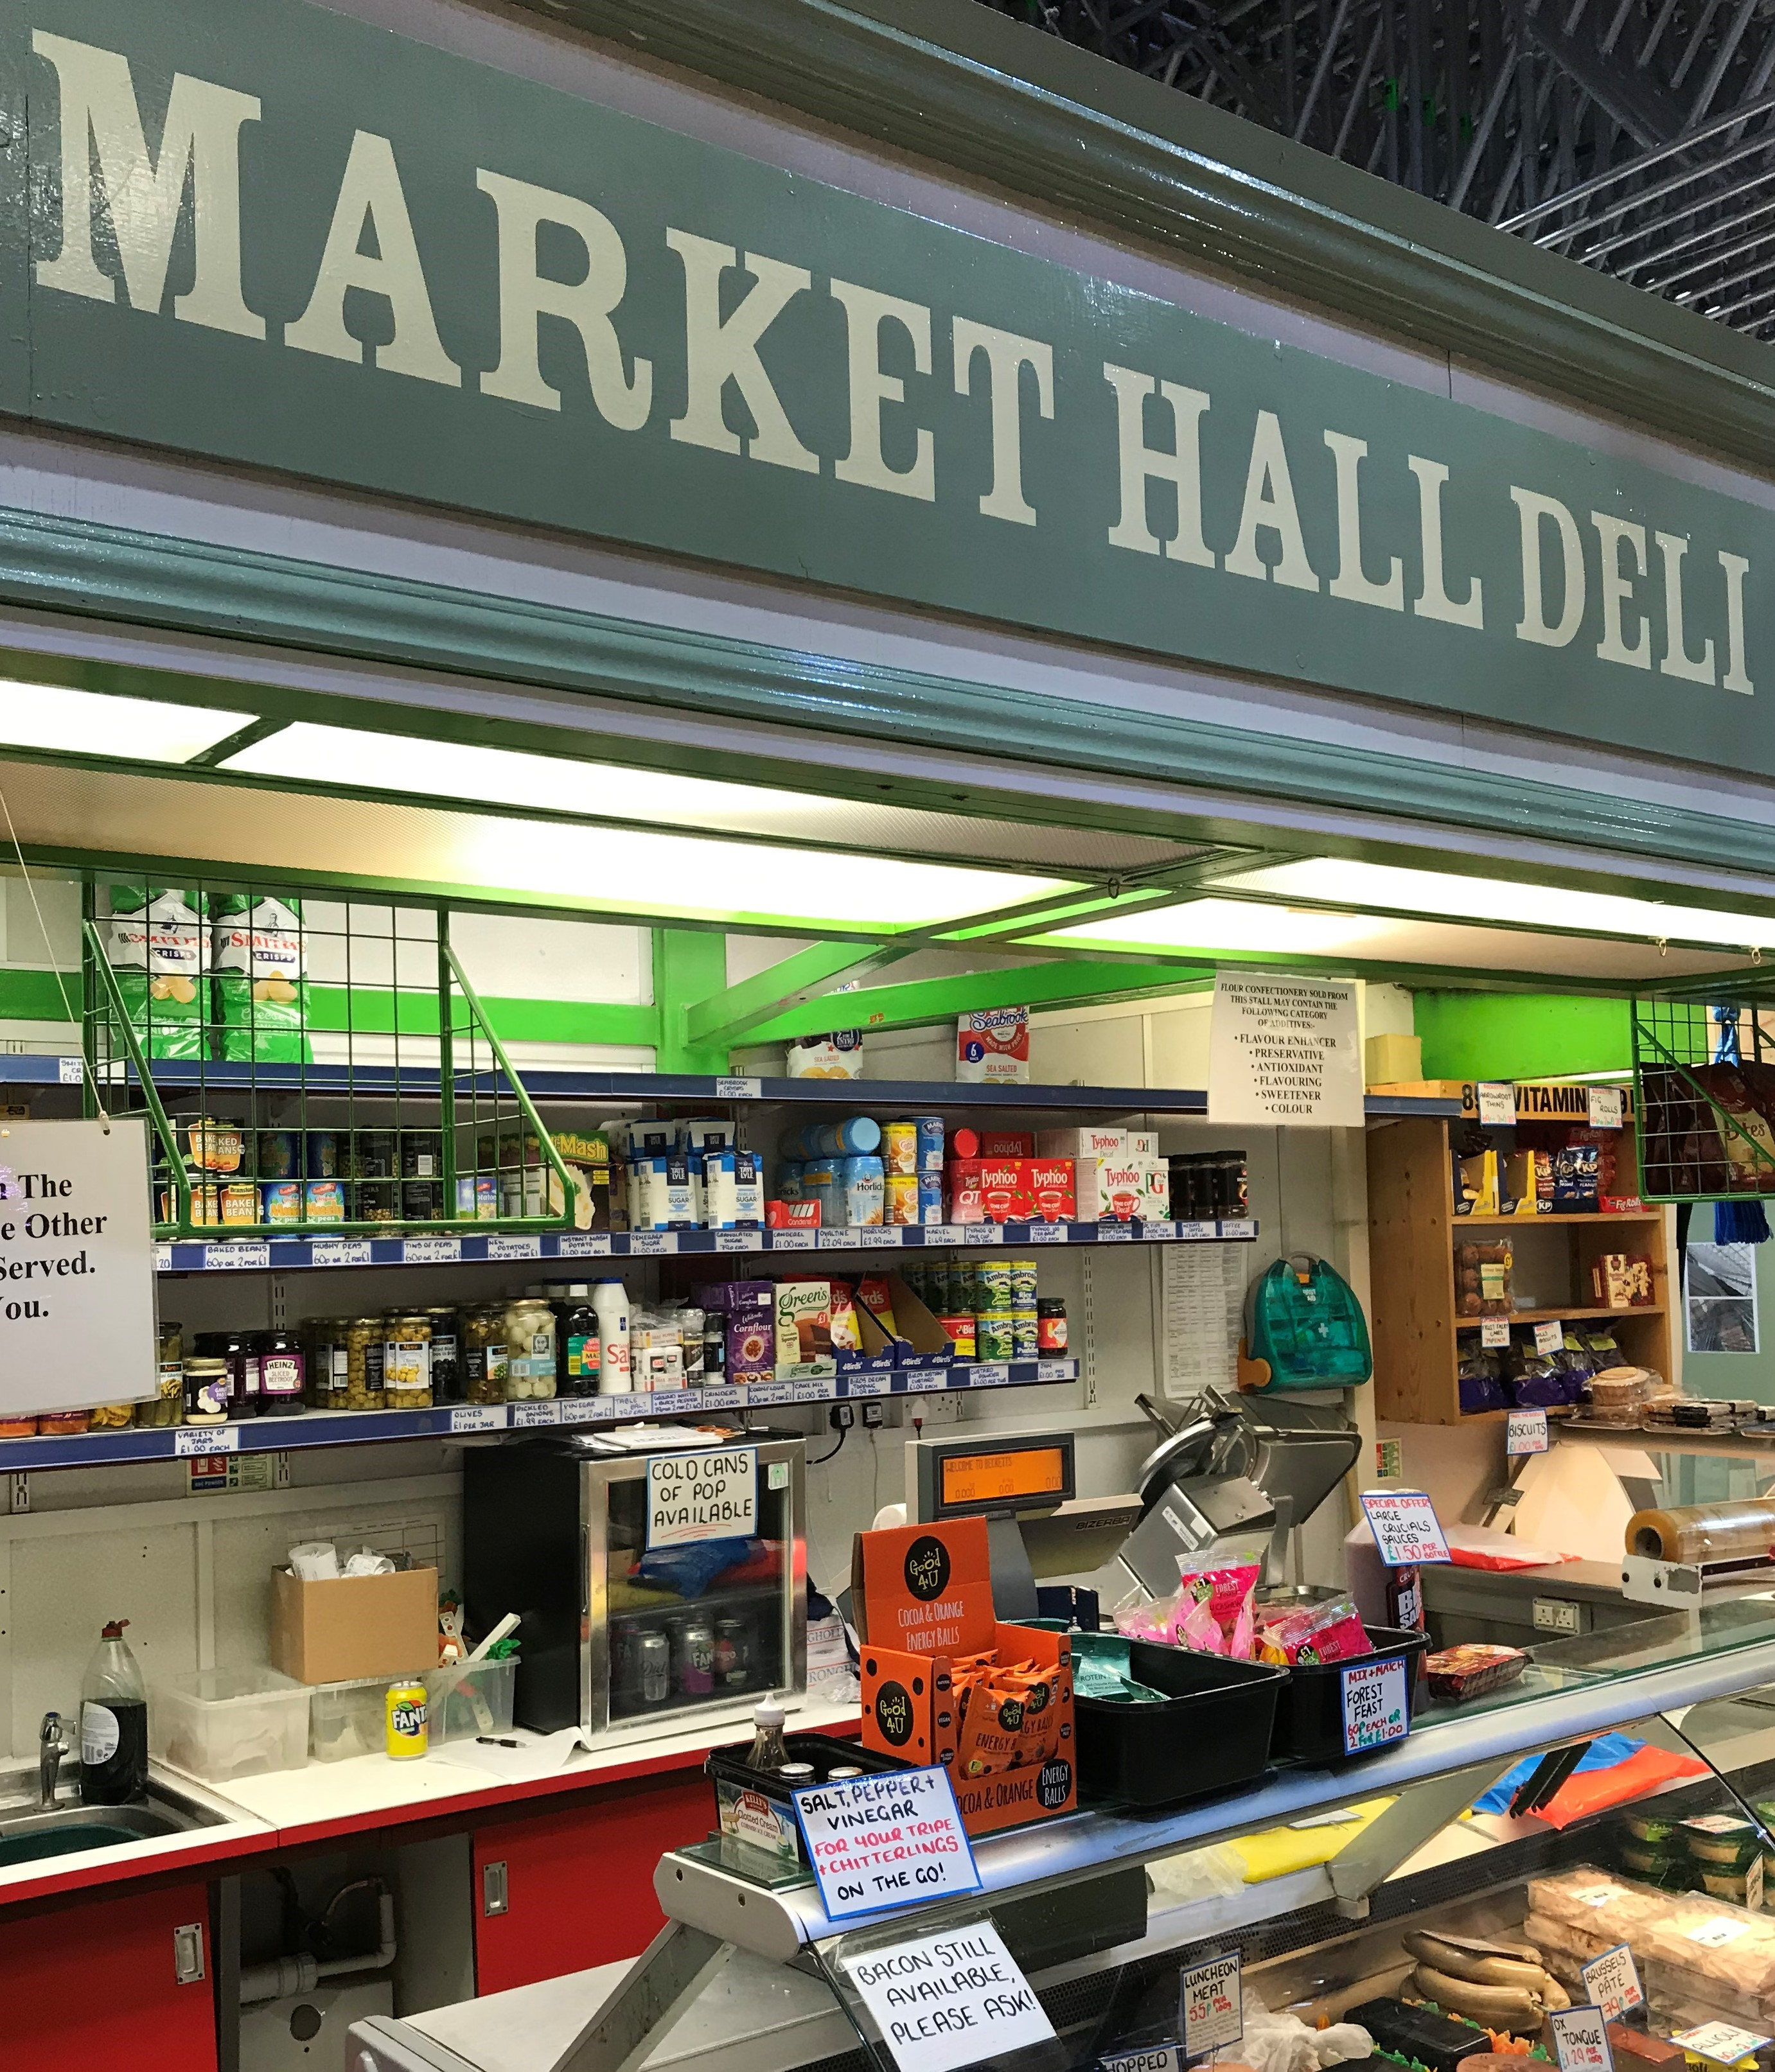 Market Hall Deli